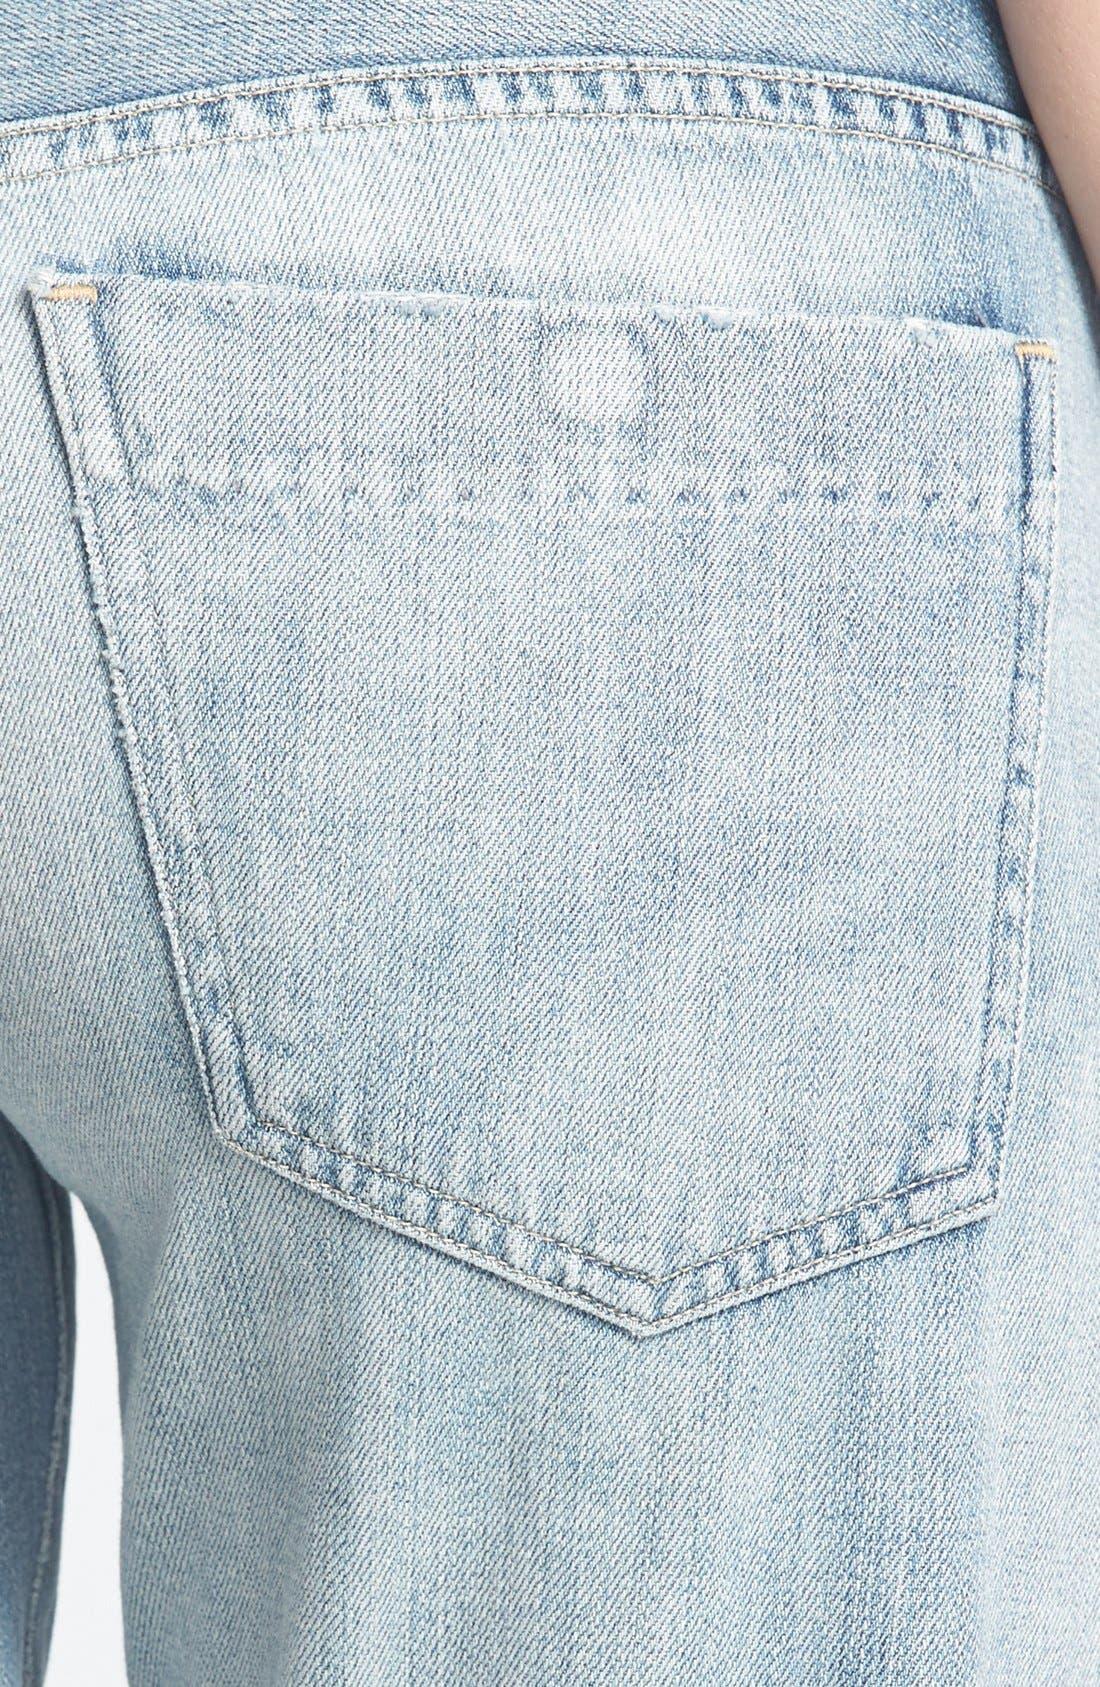 Alternate Image 3  - Citizens of Humanity 'Premium Vintage - Skyler' Boyfriend Crop Jeans (Archive)